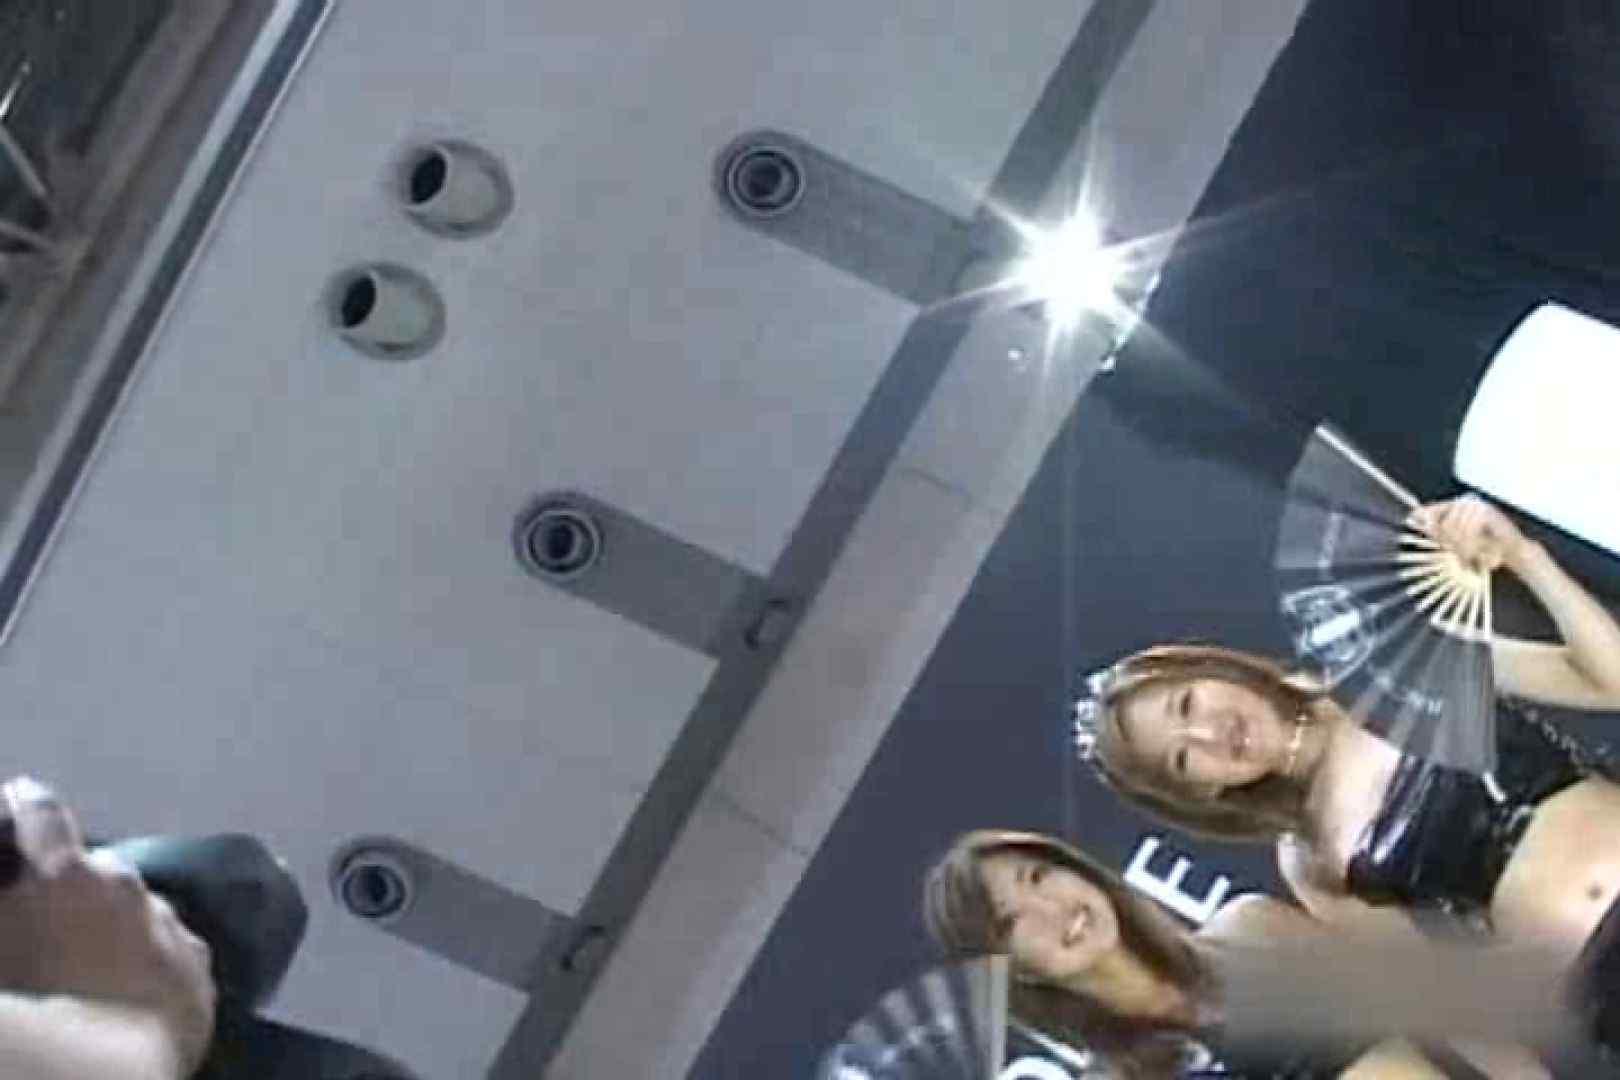 RQカメラ地獄Vol.28 アイドル | OLセックス  78画像 37